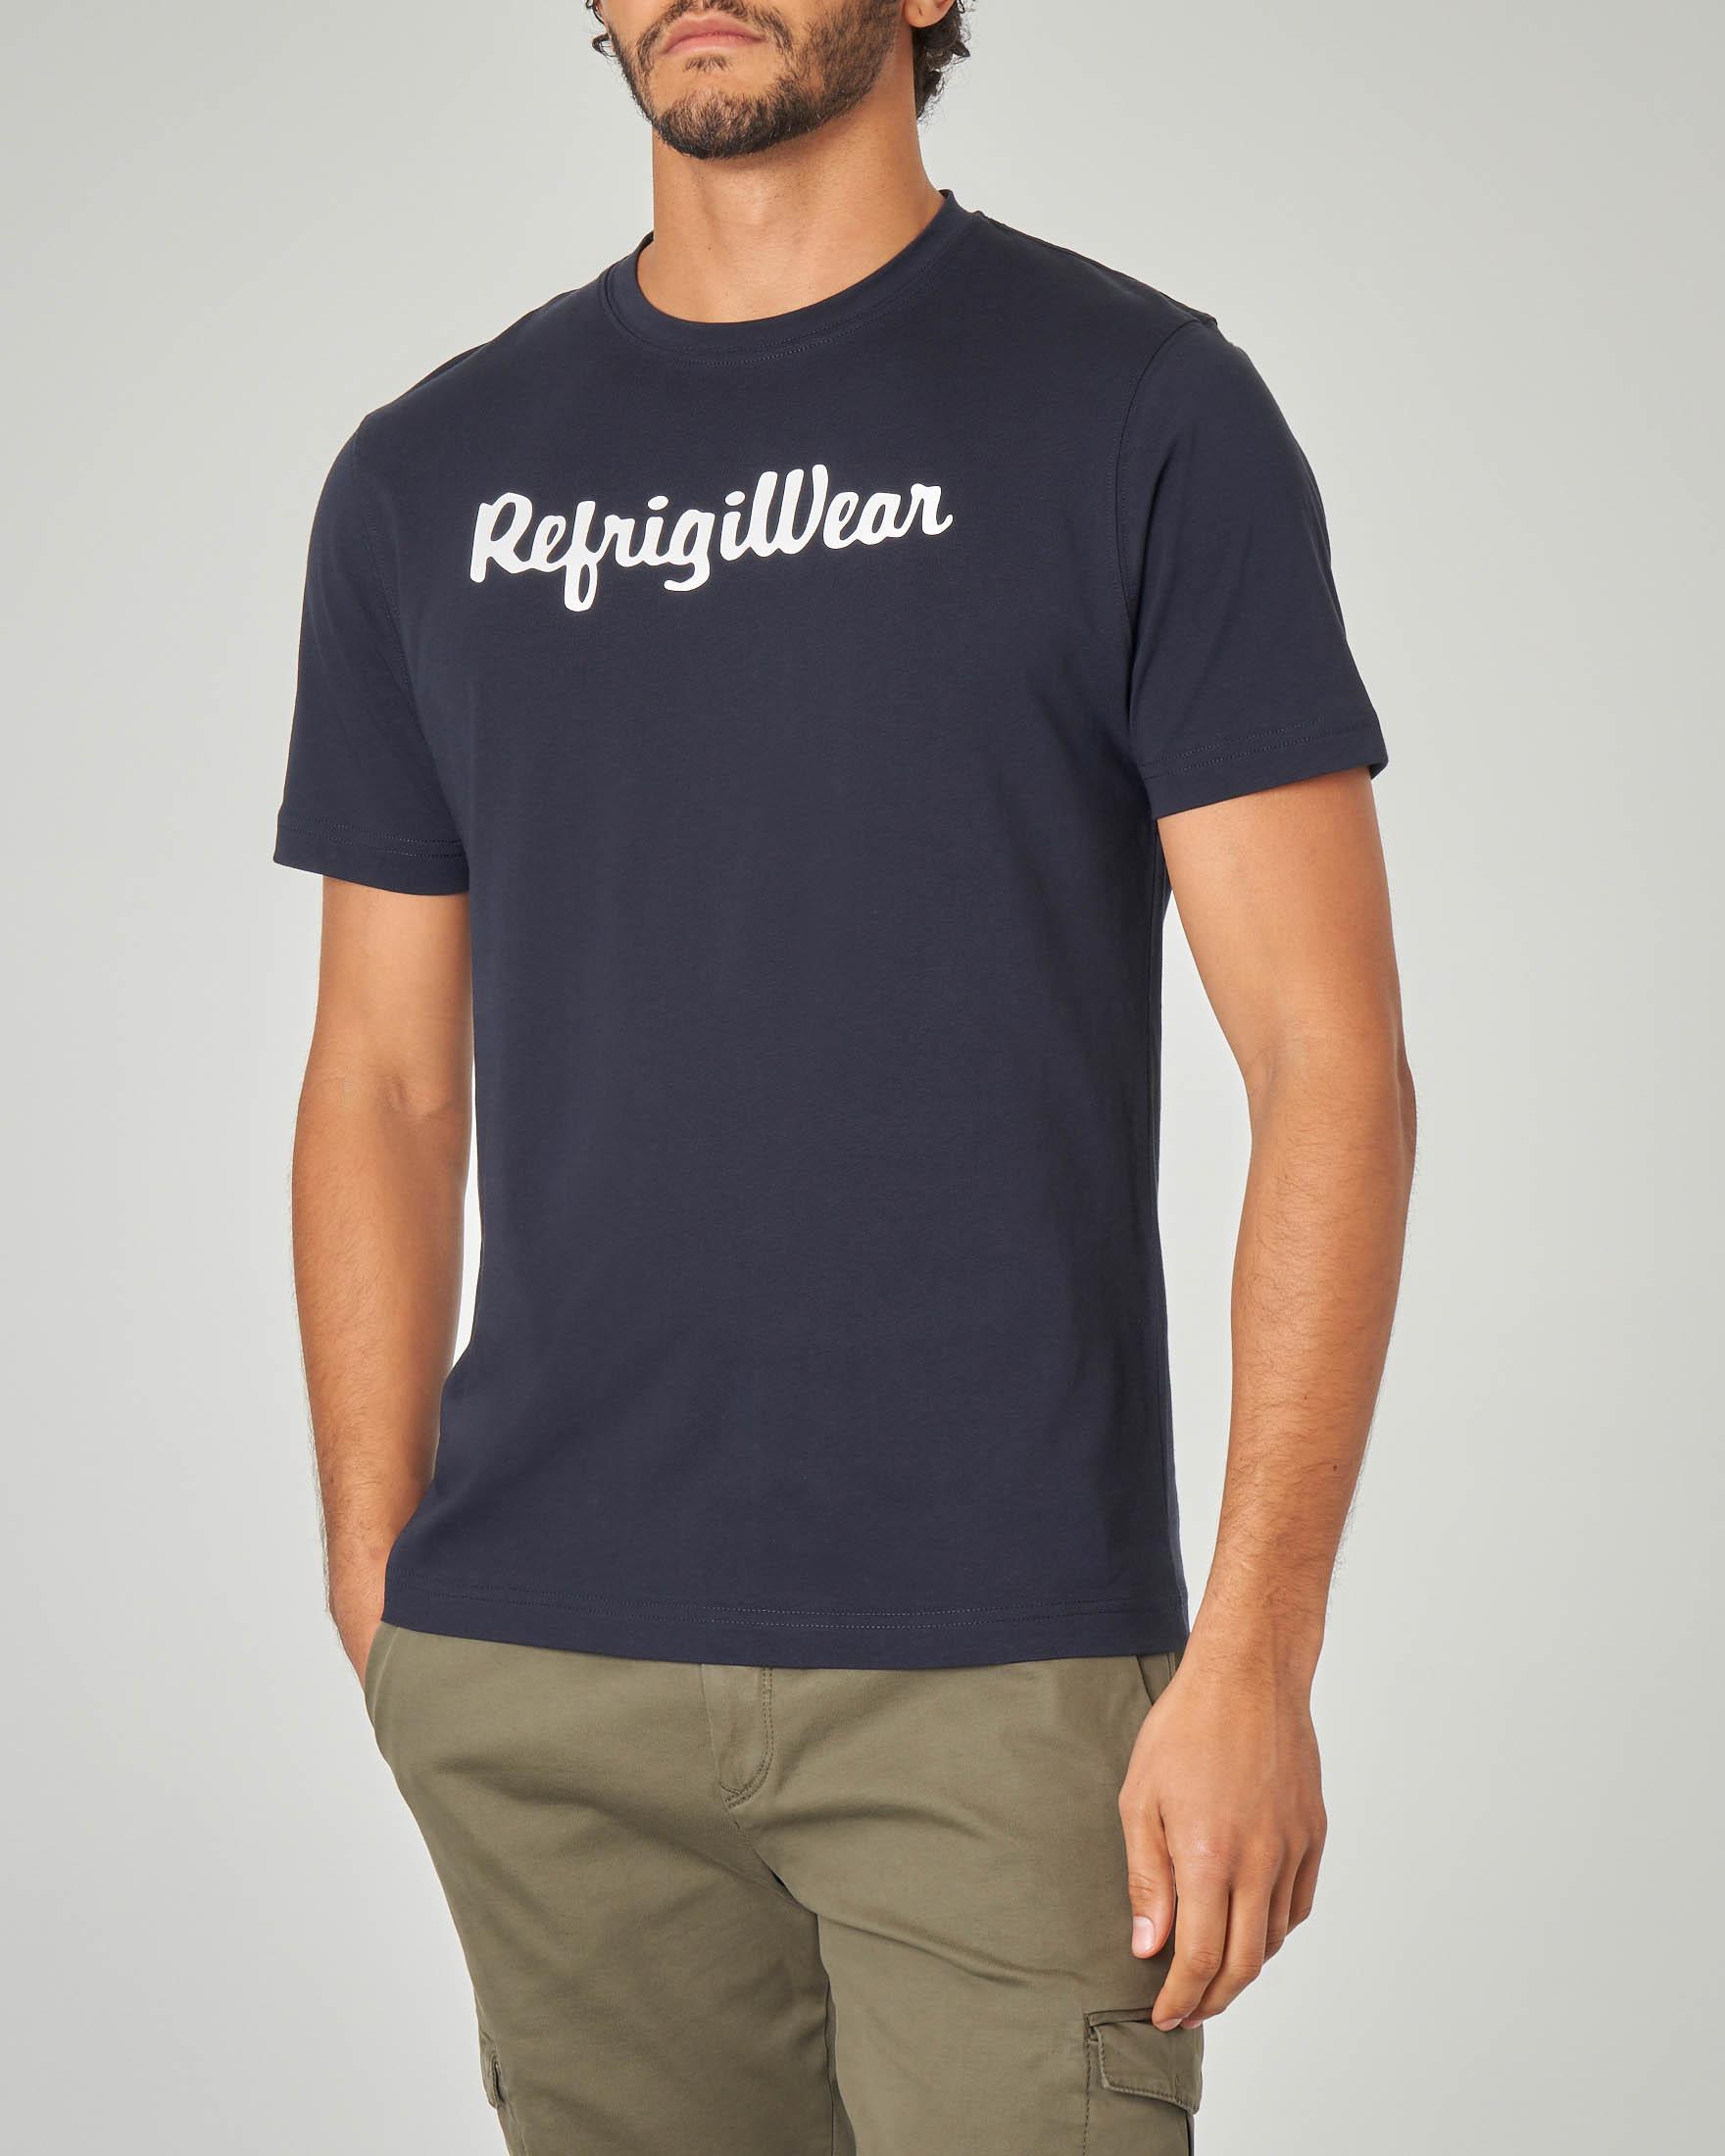 T-shirt blu con logo bianco stampato